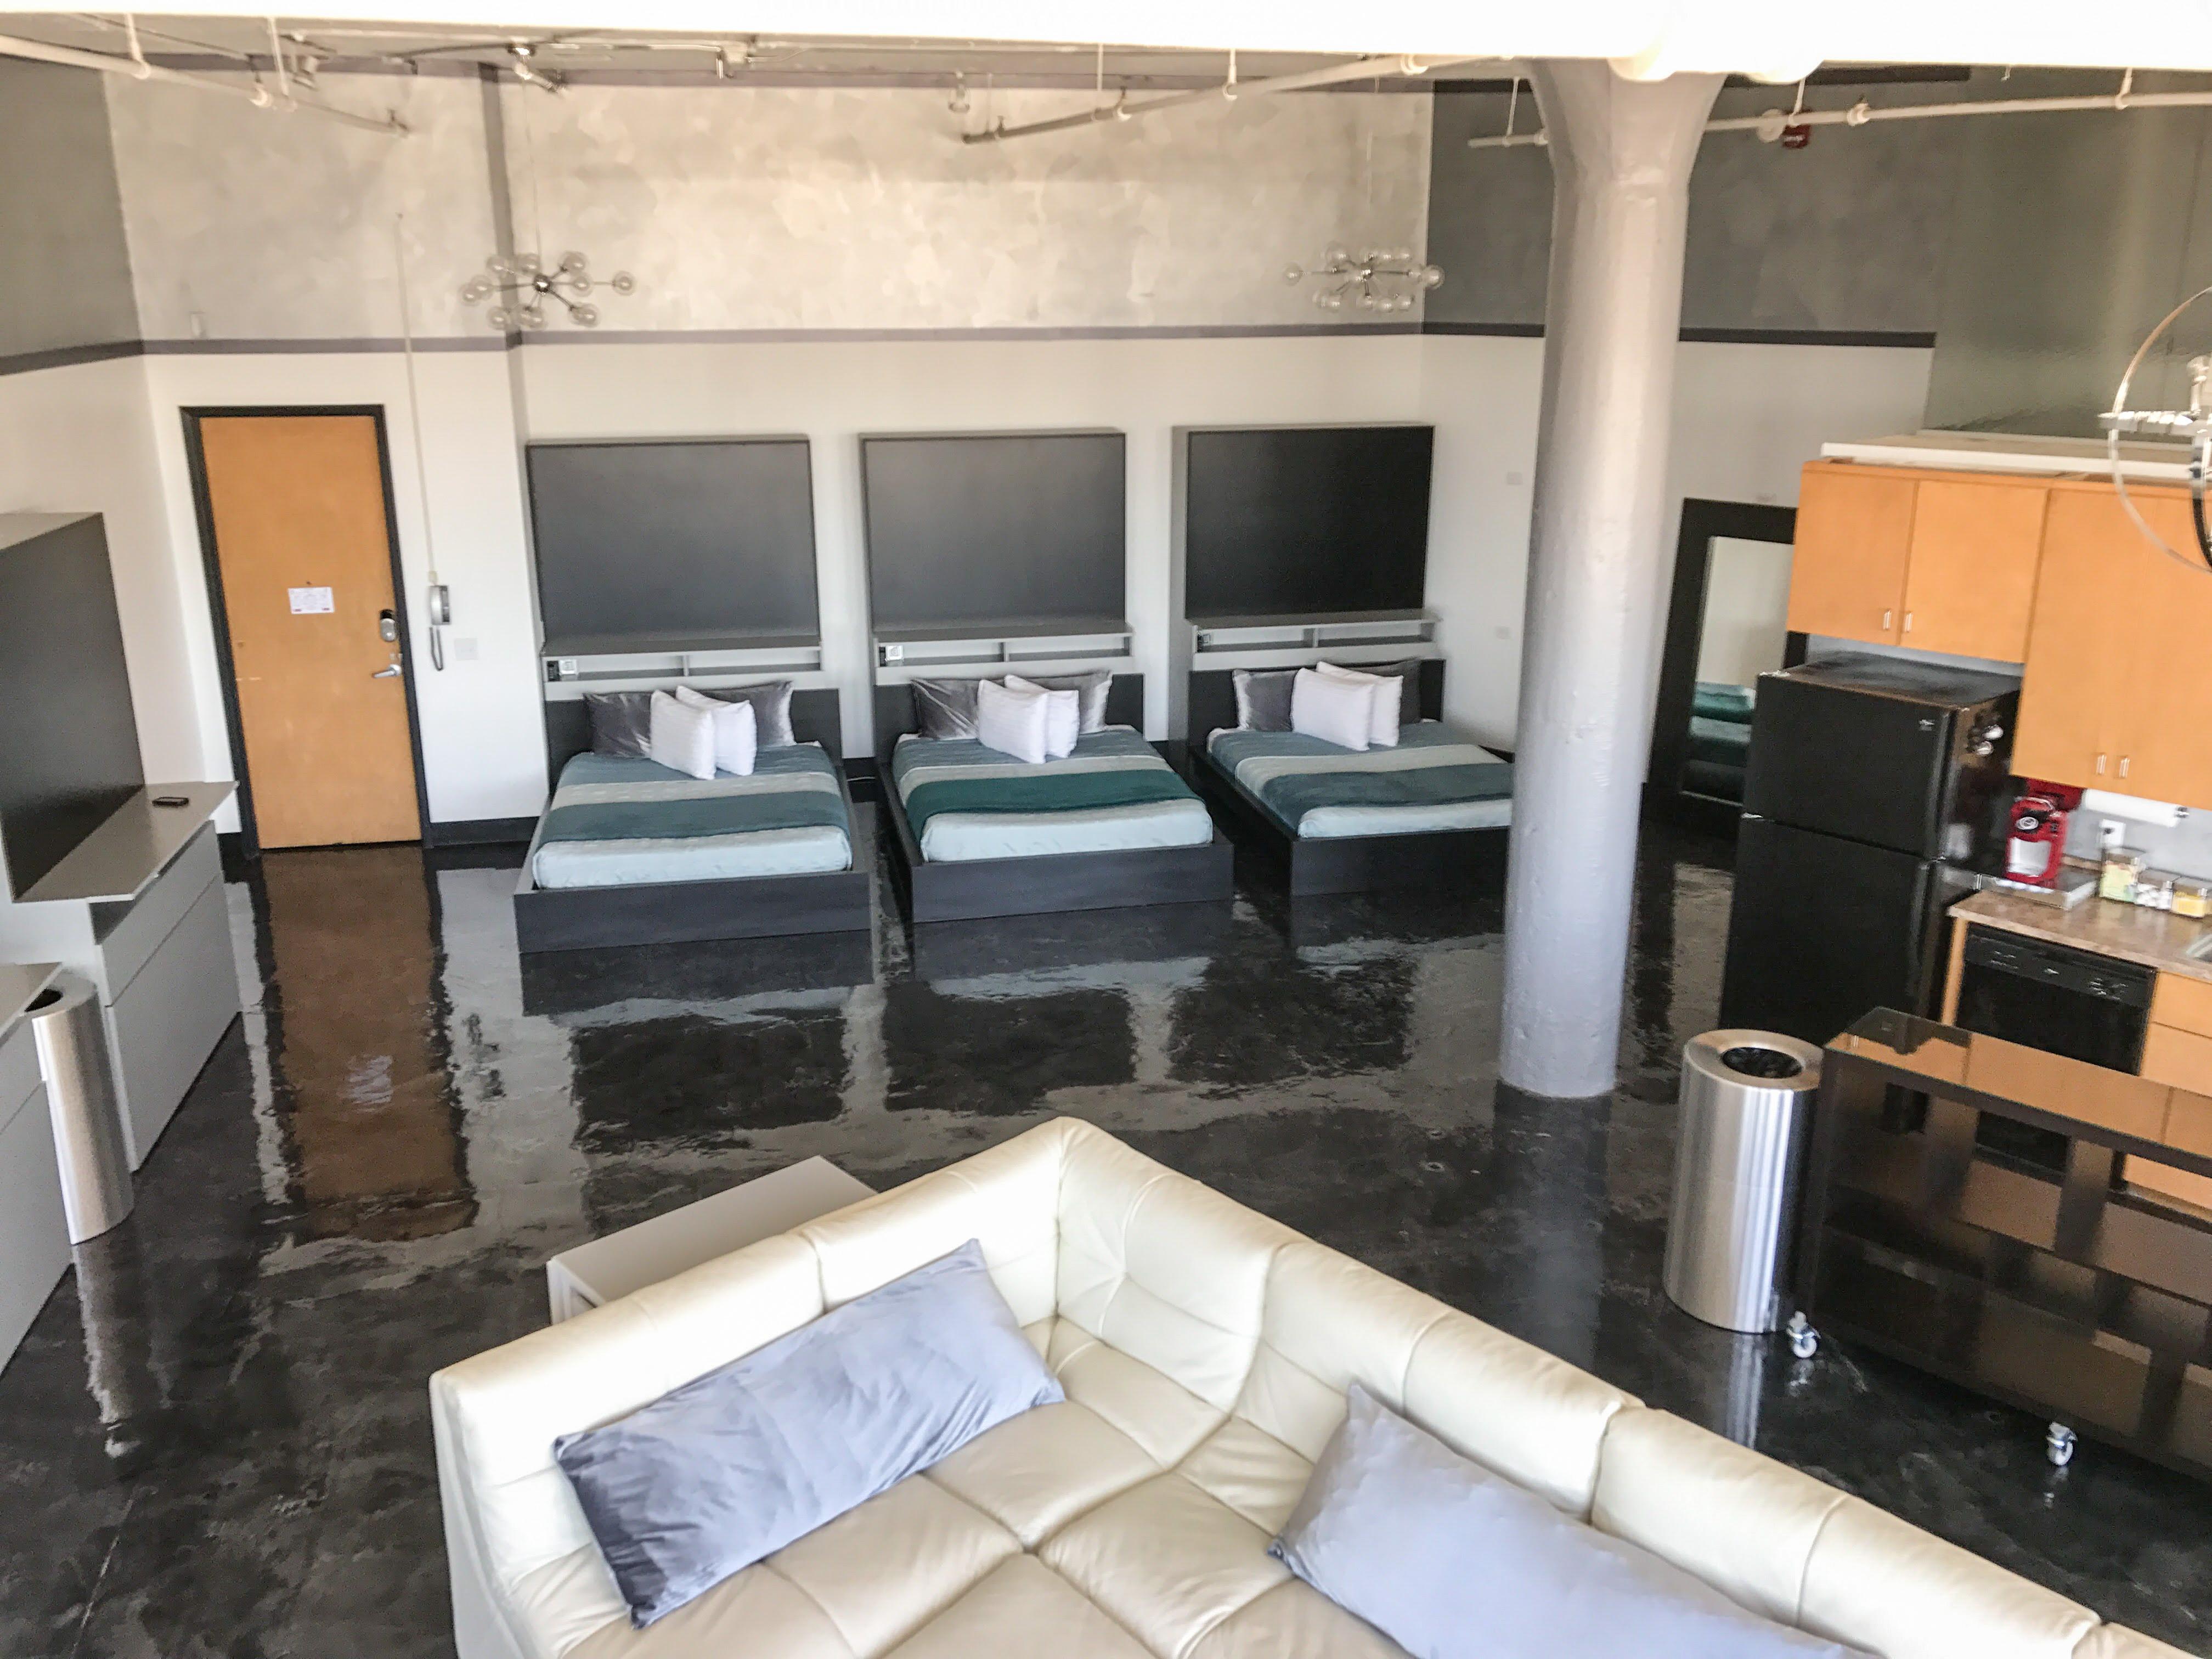 Loft Reverie Hotel 801 - Cloud Sofa + Beds + Memory Foam + Queen Zbed